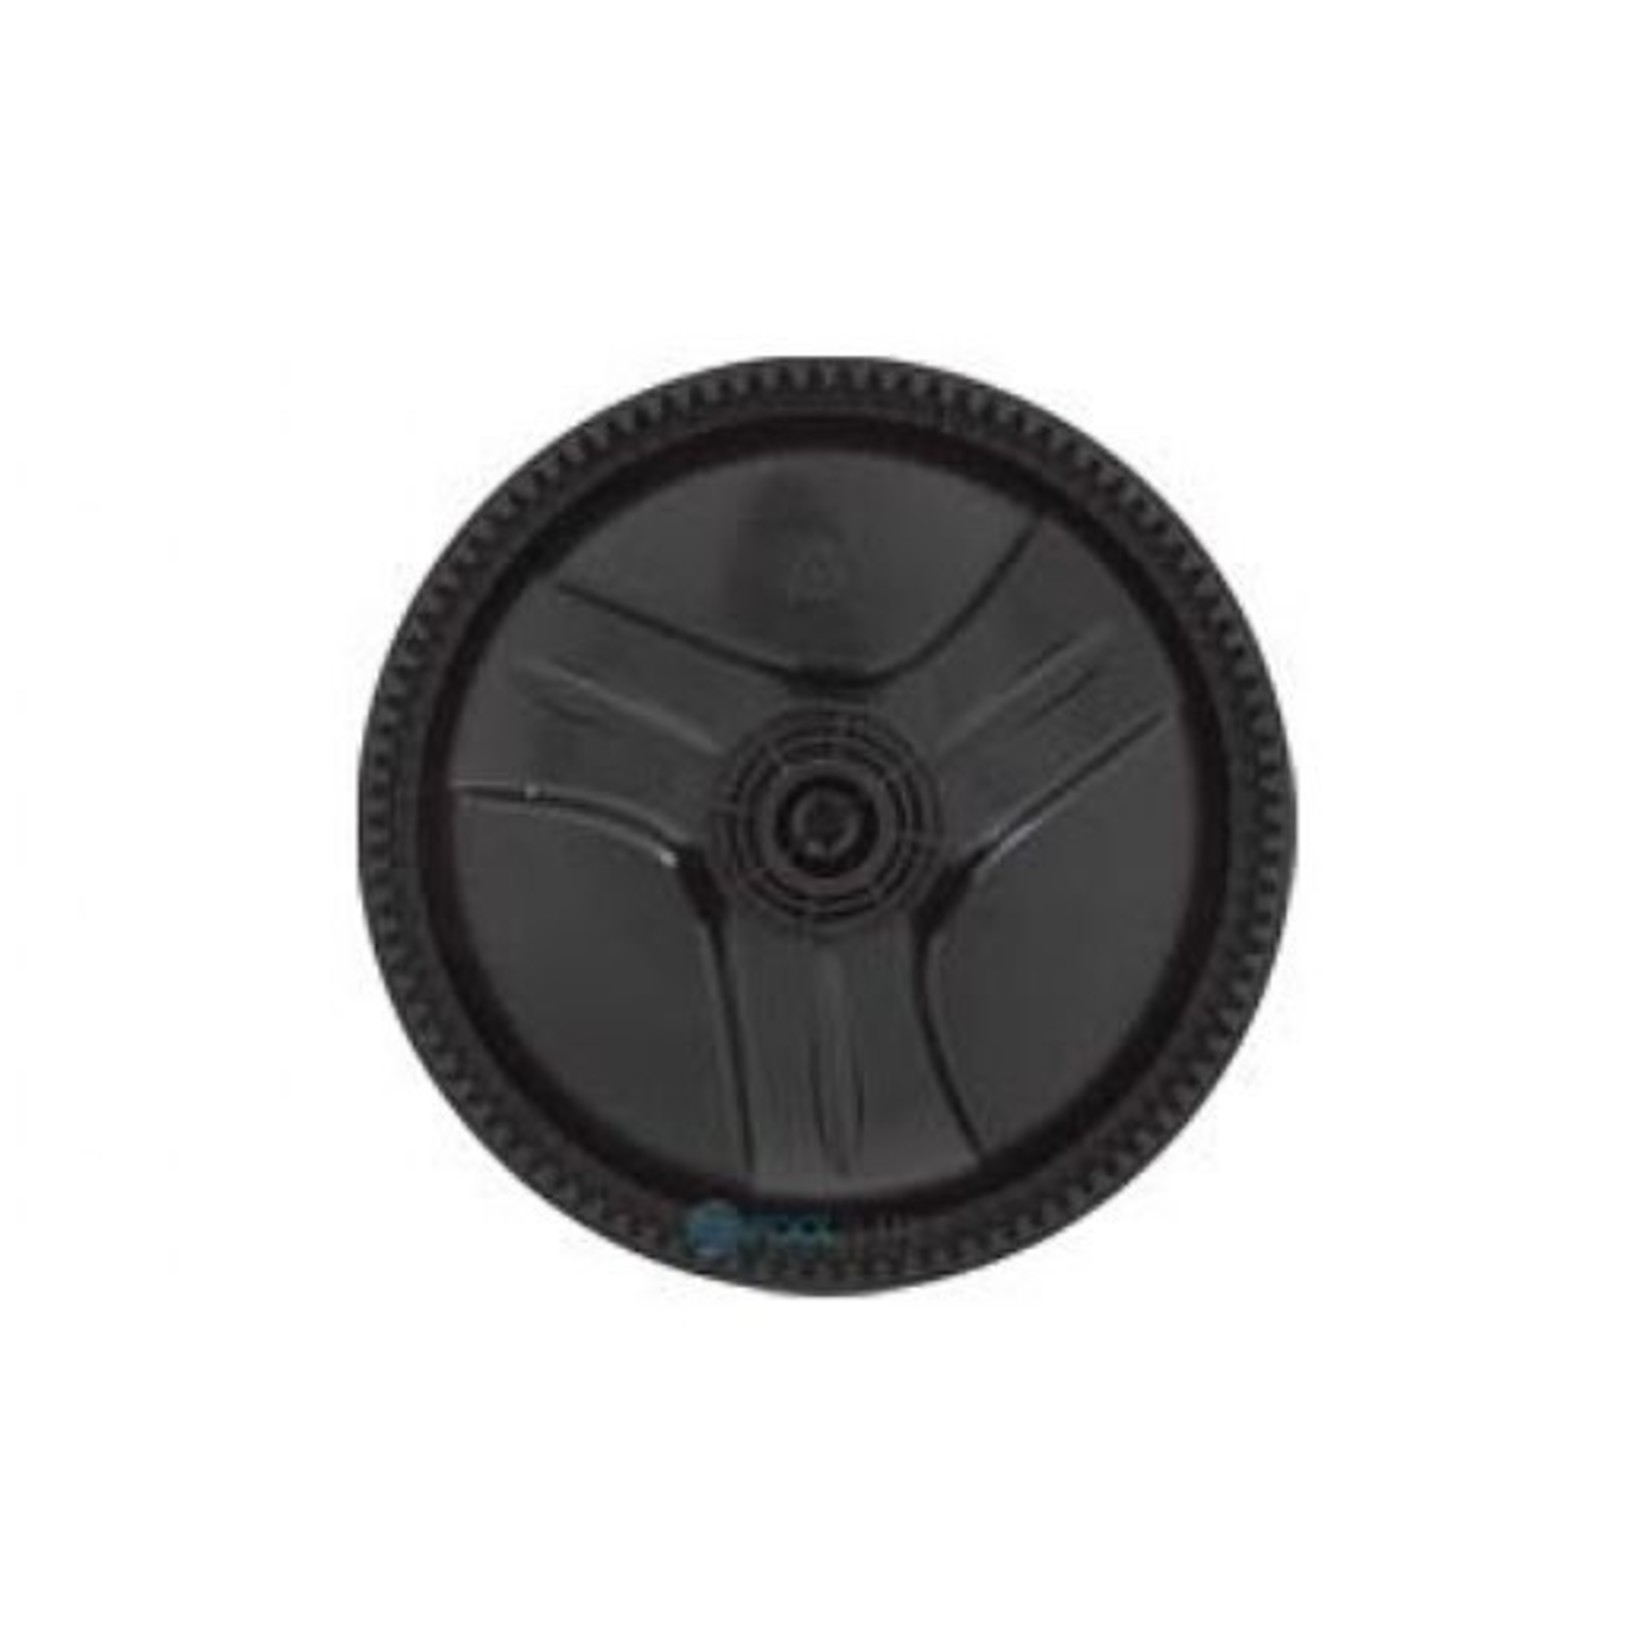 Polaris Large Wheel Black 9400 POLARIS